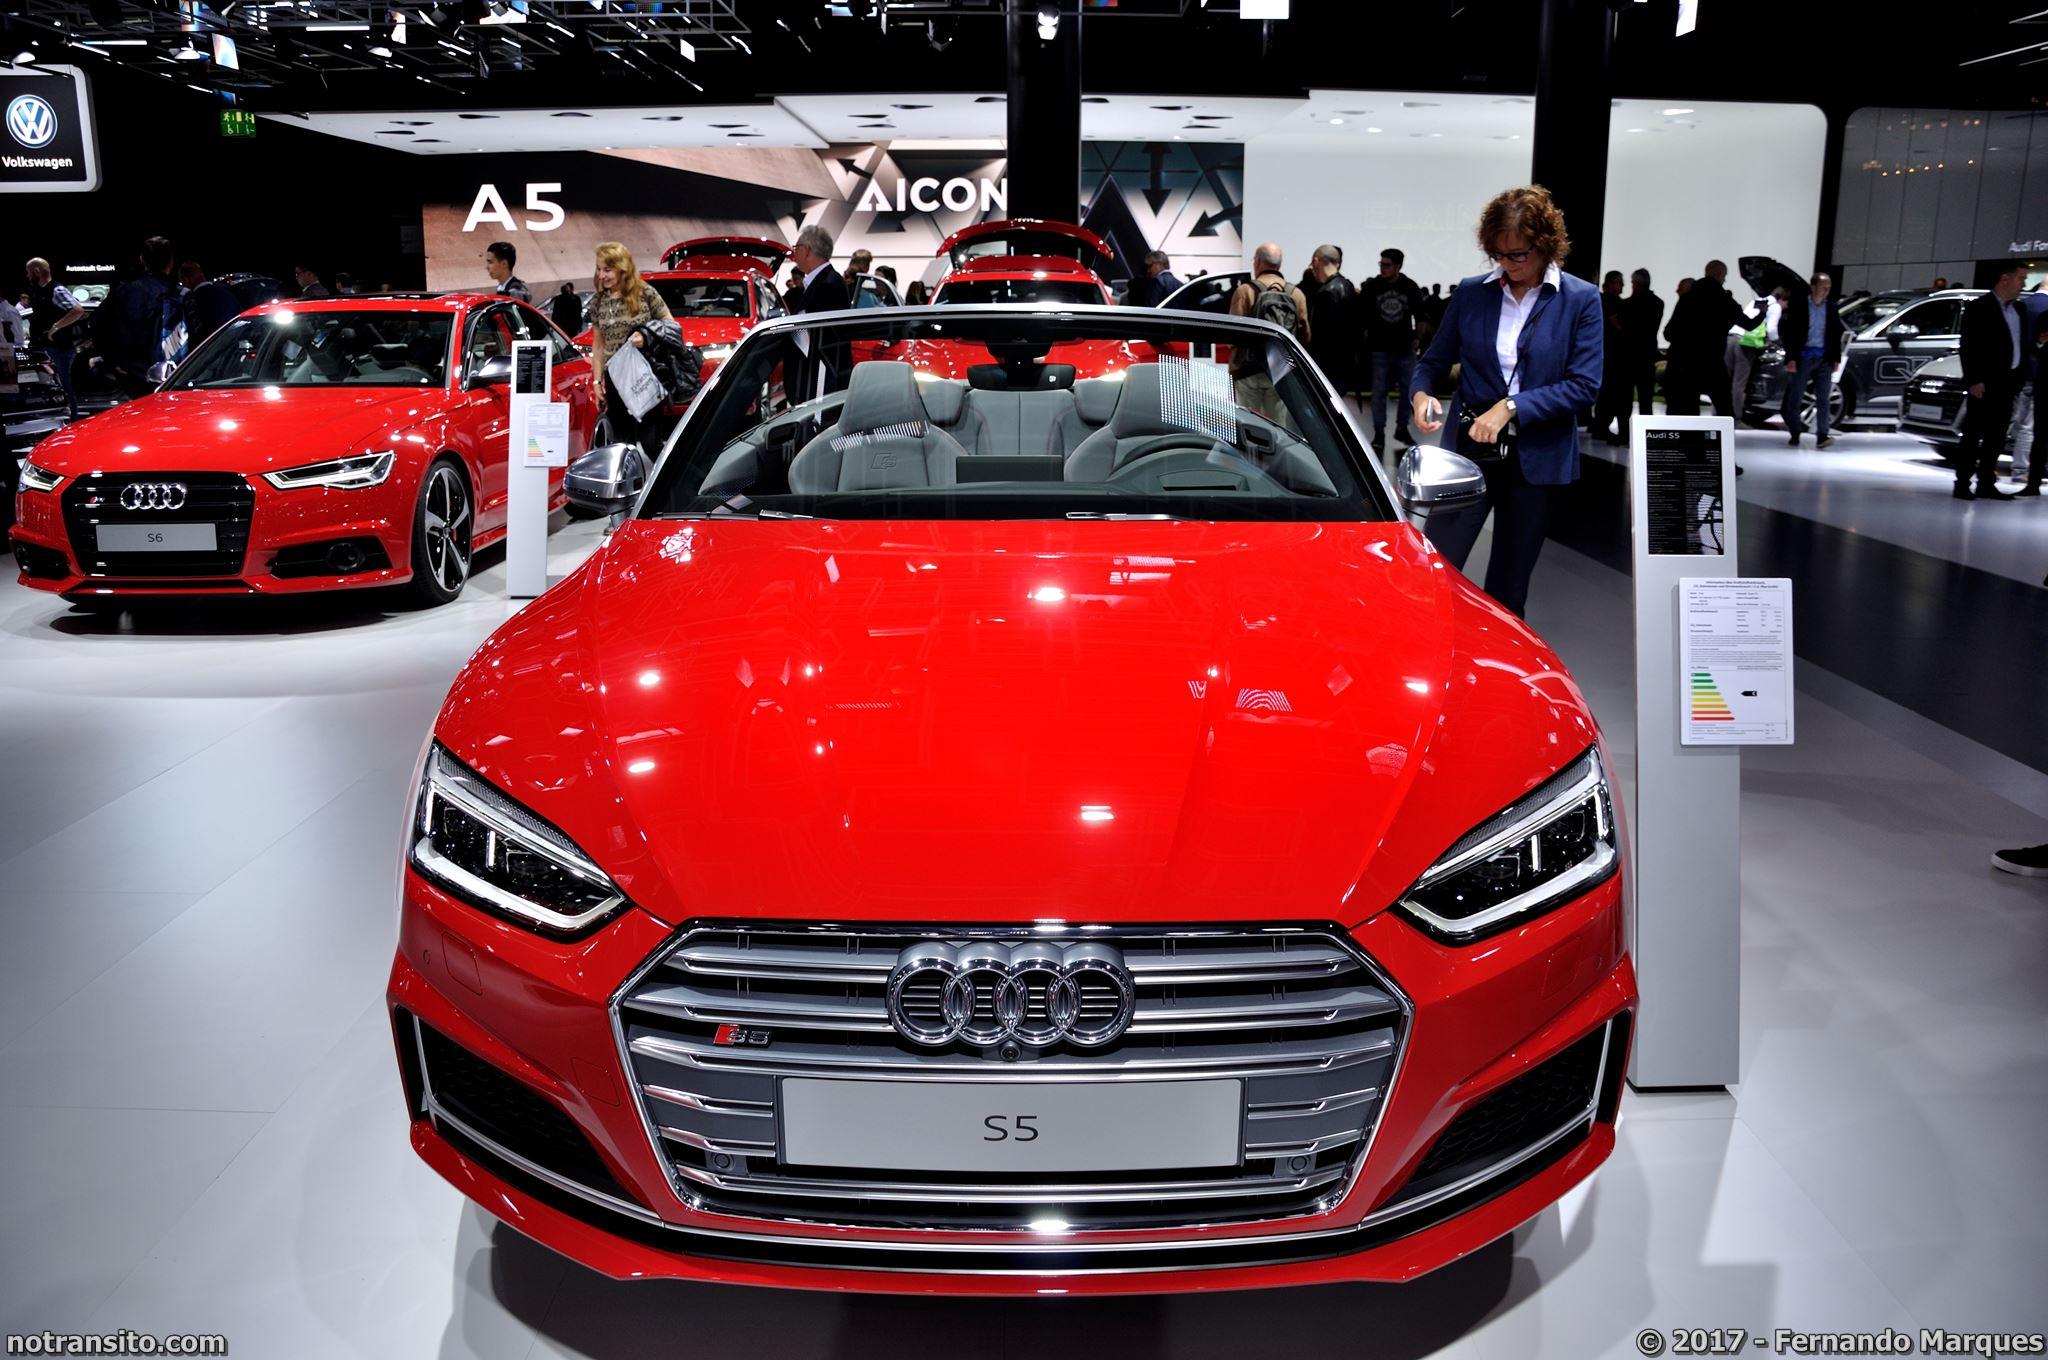 Audi-S5-Frankfurt-2017-001